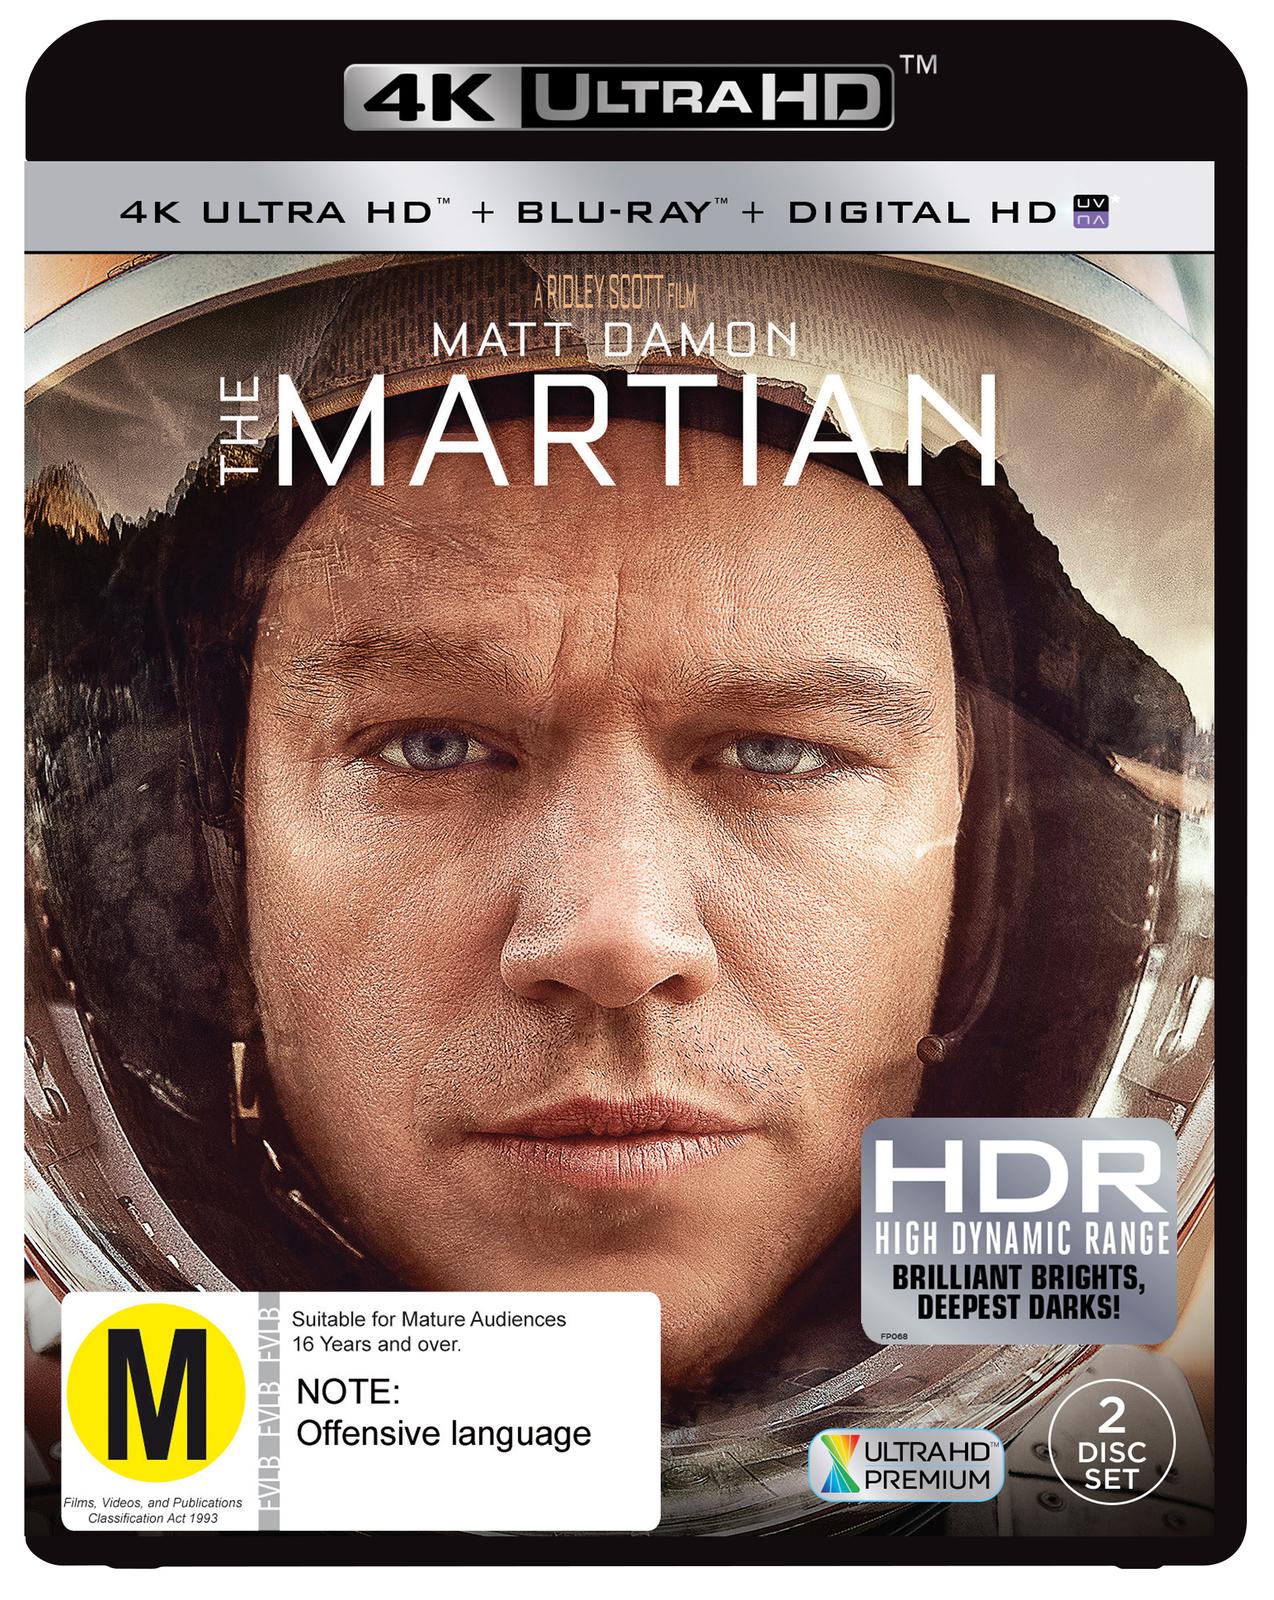 The Martian on UHD Blu-ray image